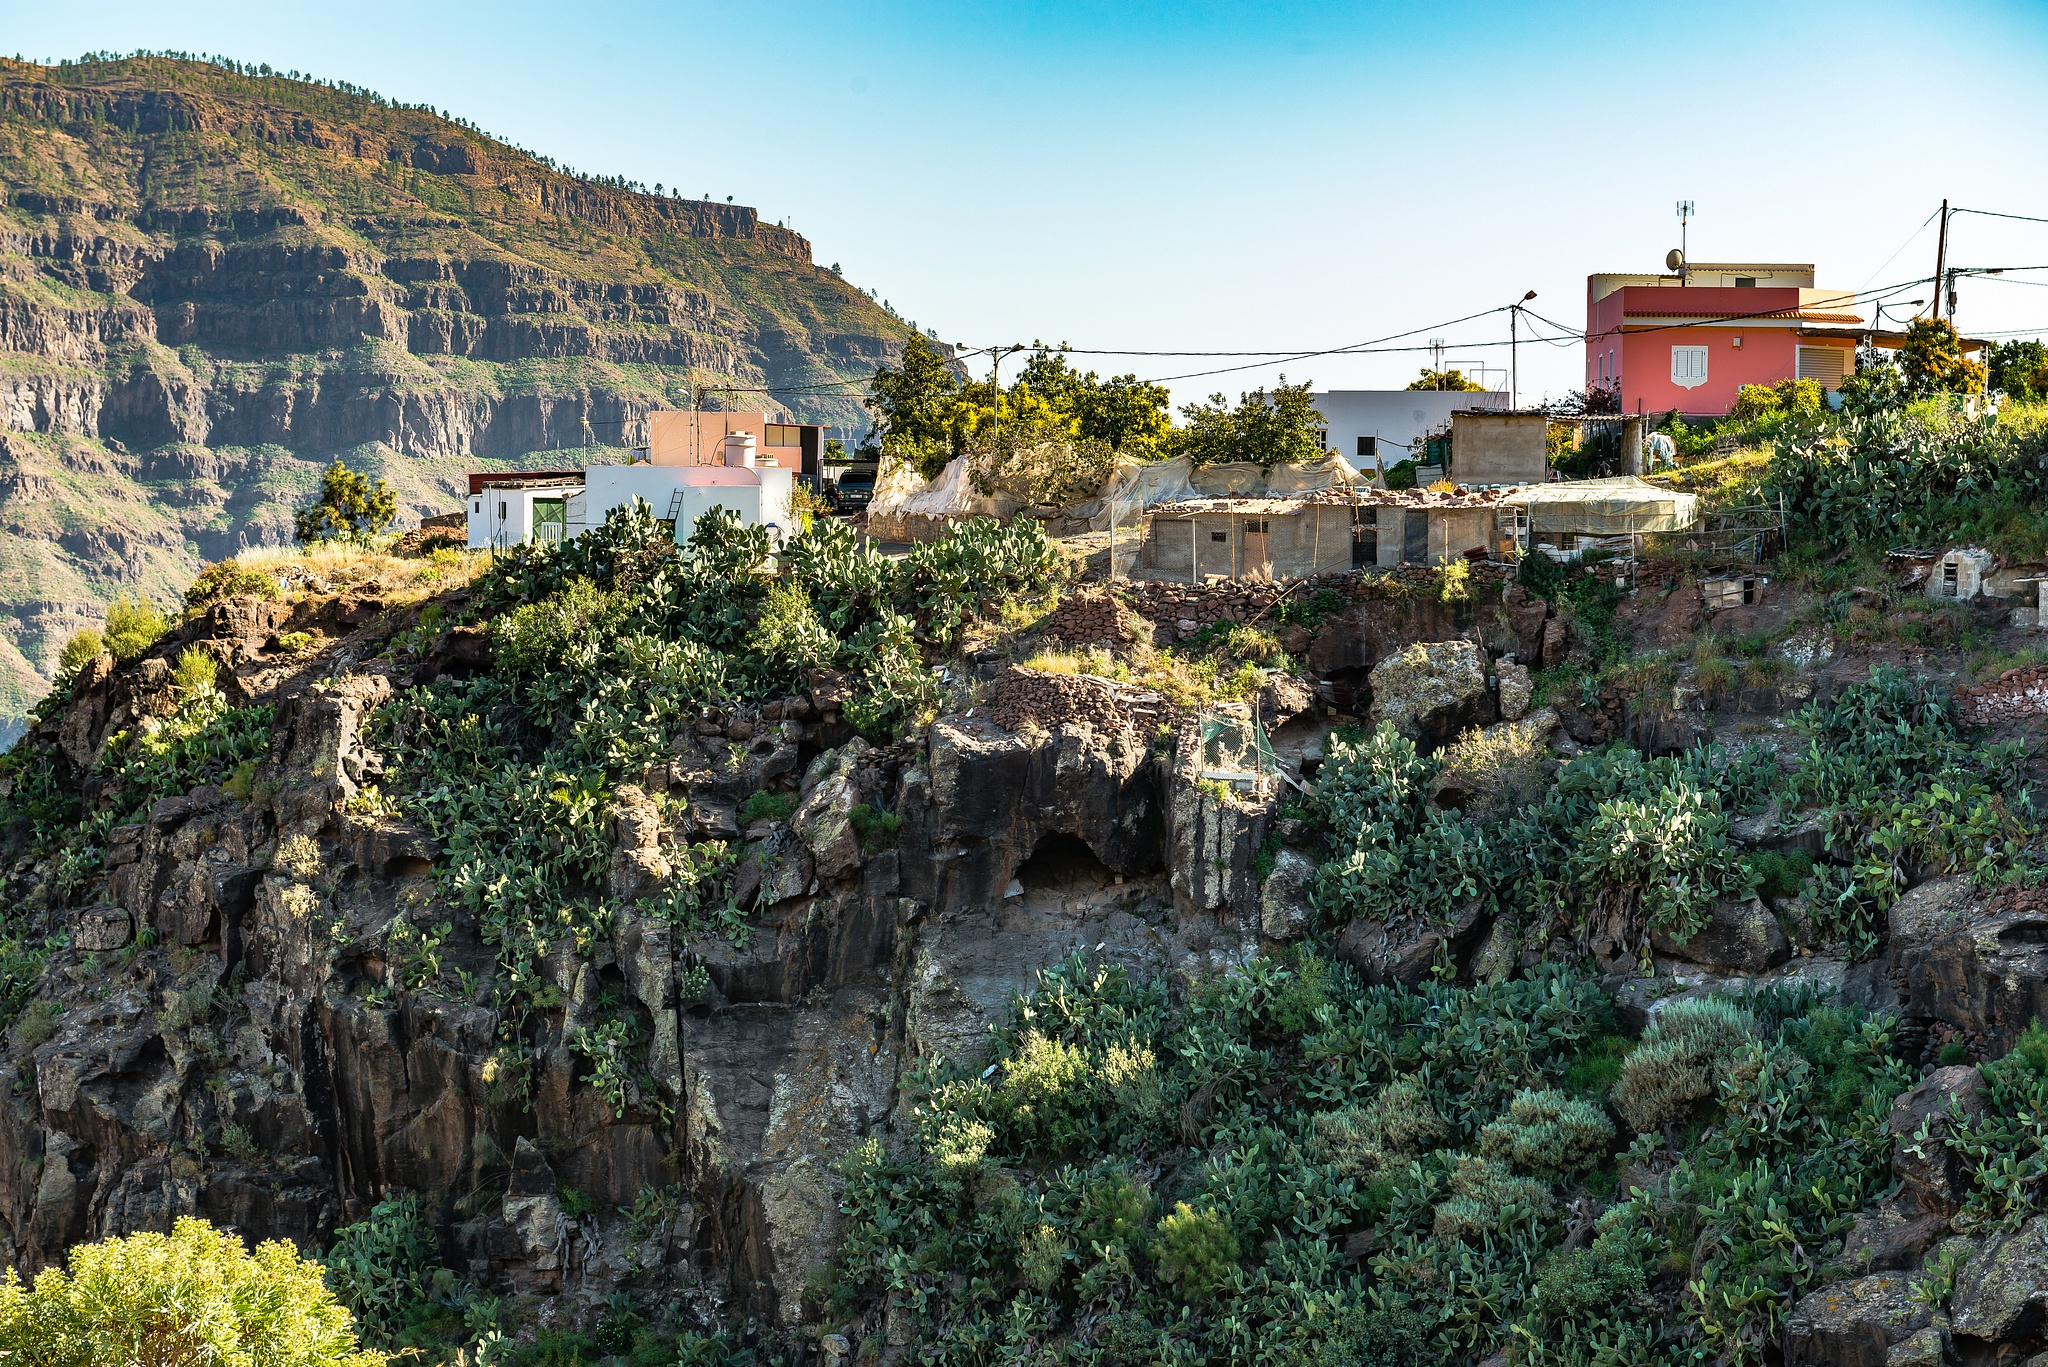 Village on the Edge - Gran Canaria by Hyen